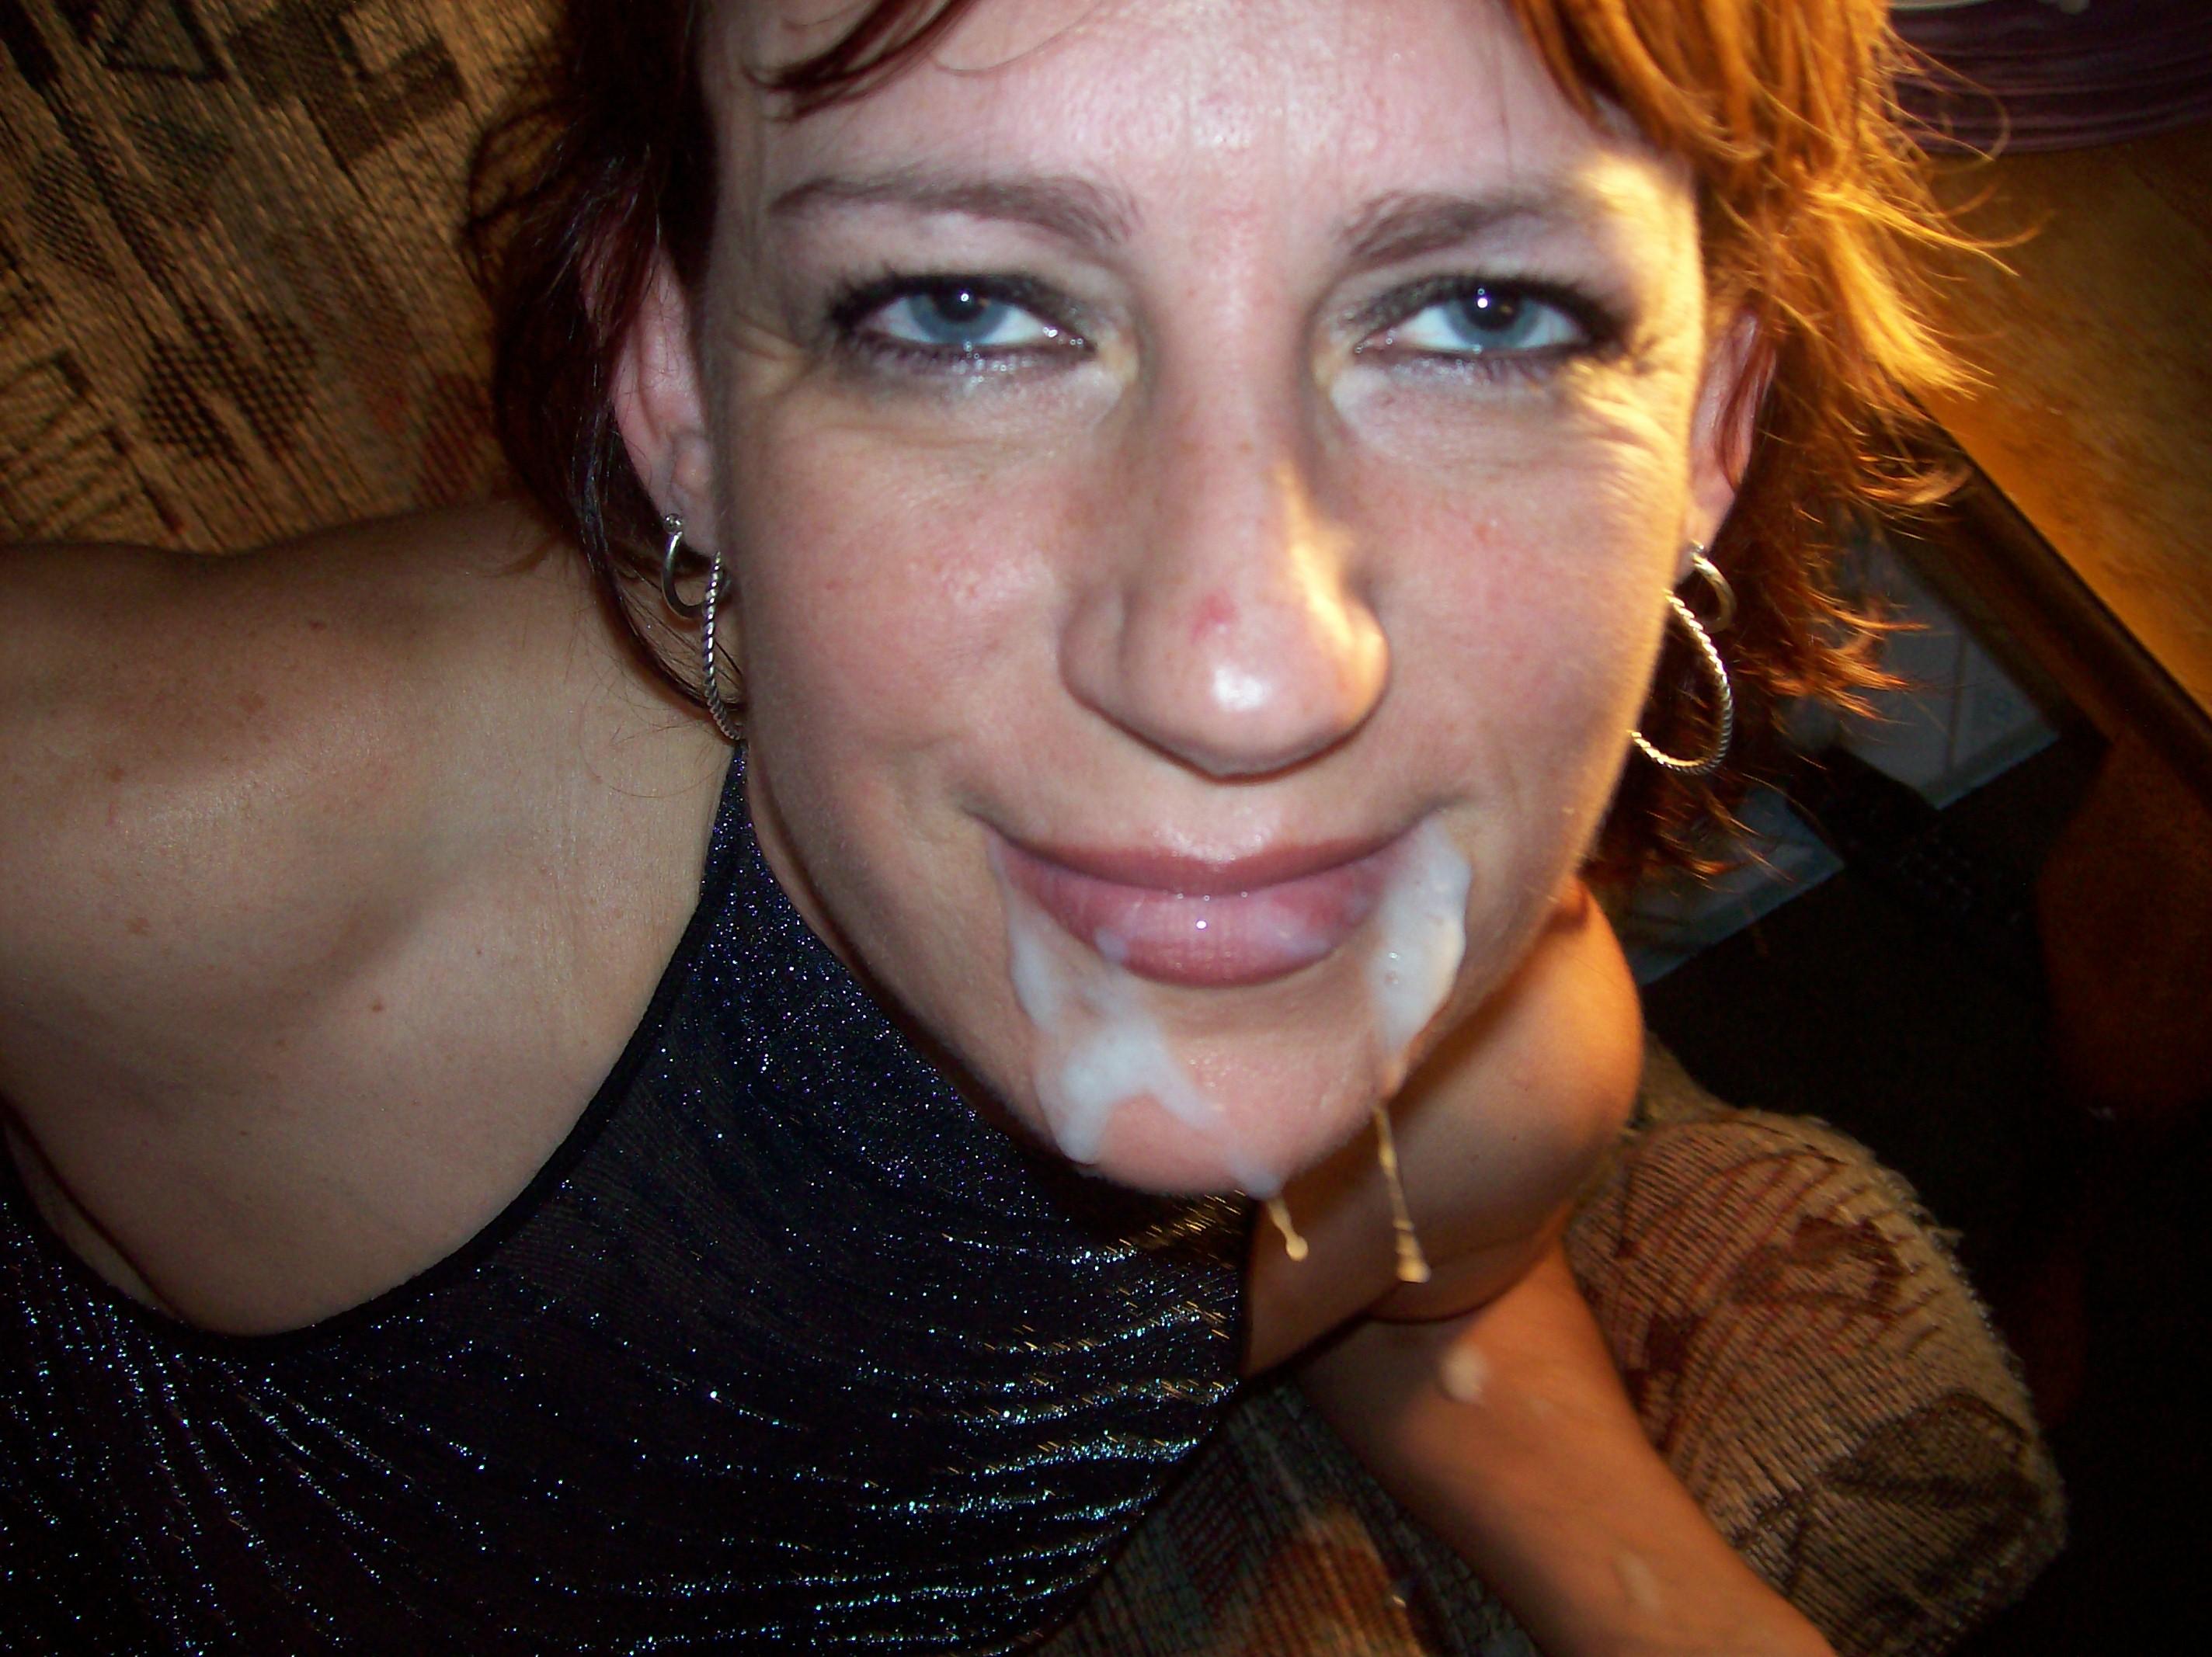 amateur women sucking cock